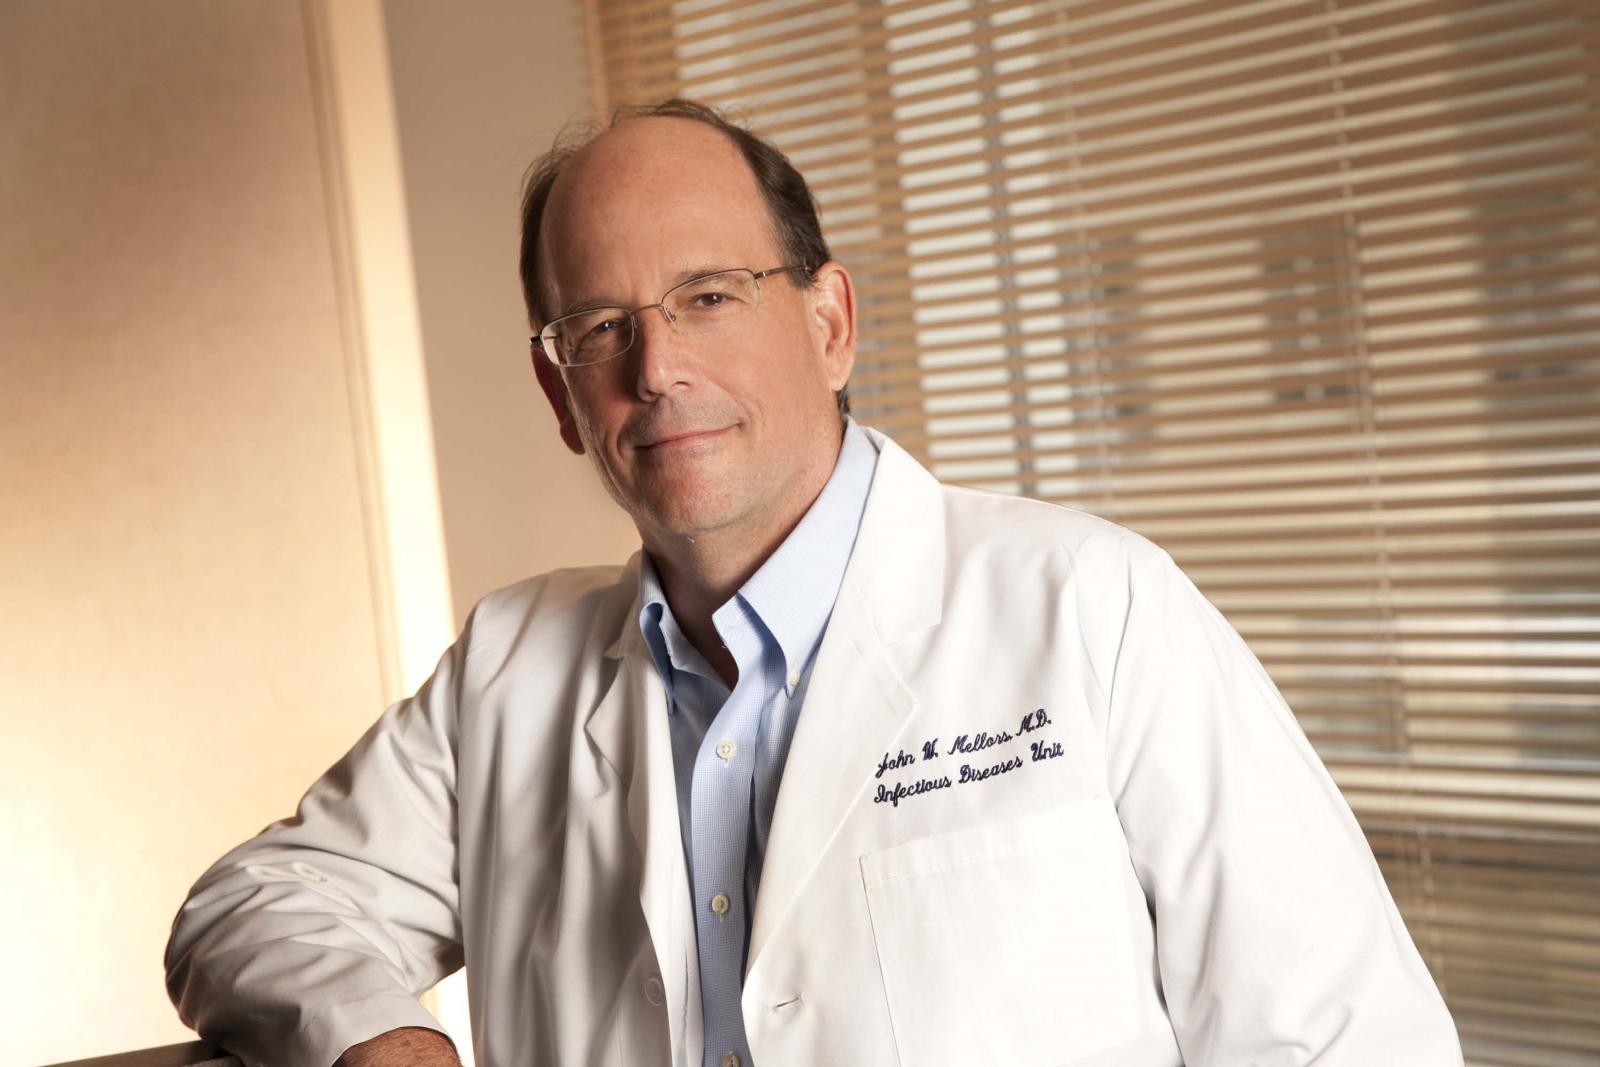 John Mellors, MD